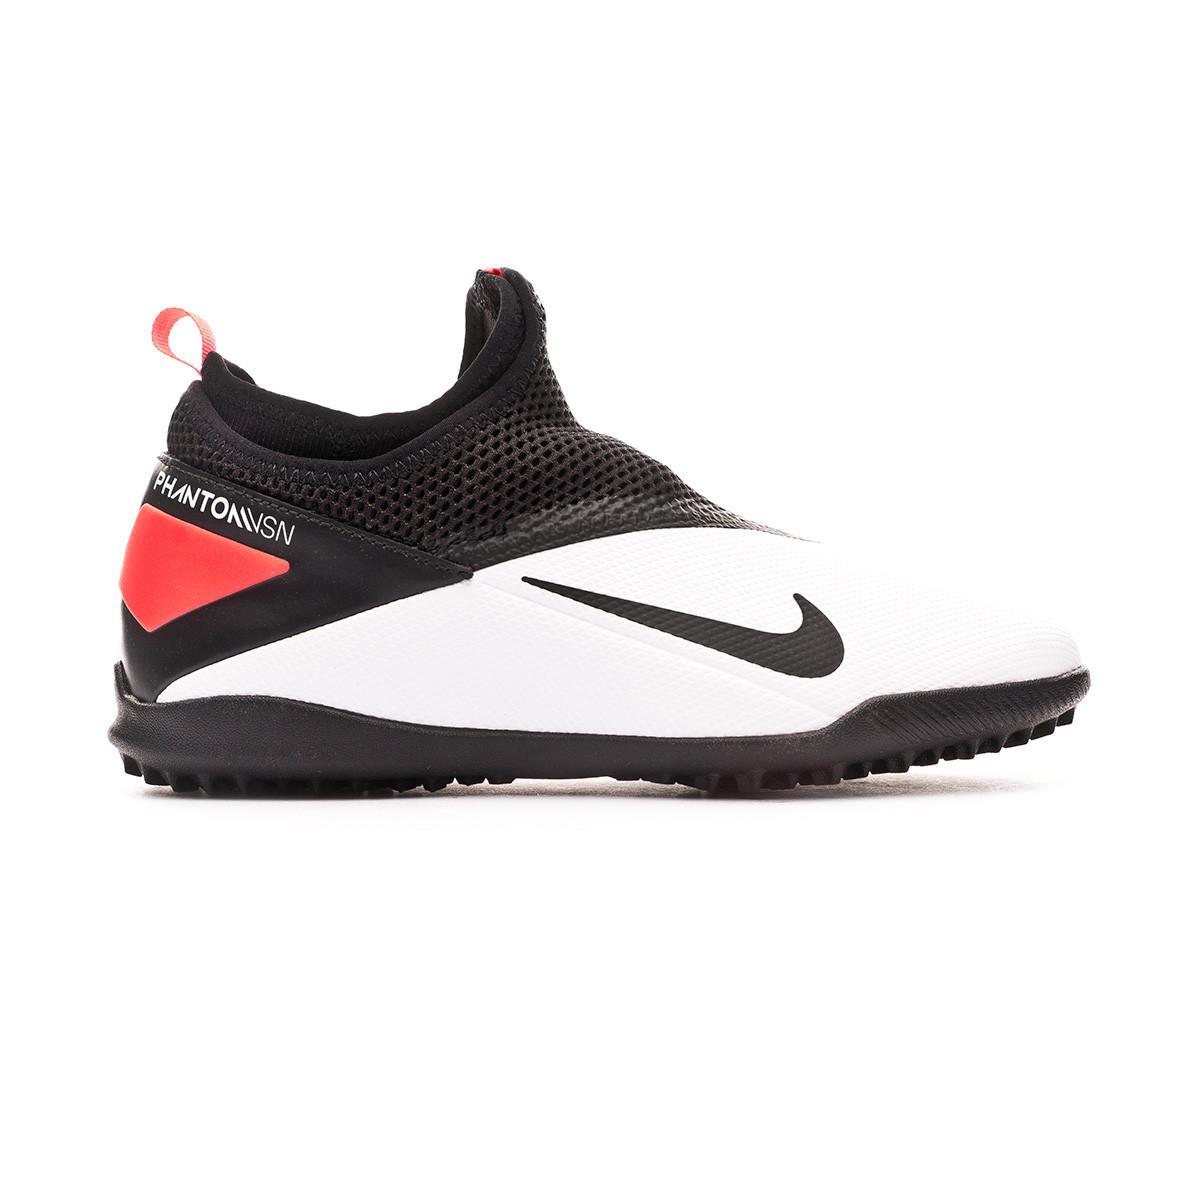 Chaussure de foot Nike Phantom Vision II Academy DF Turf Enfant